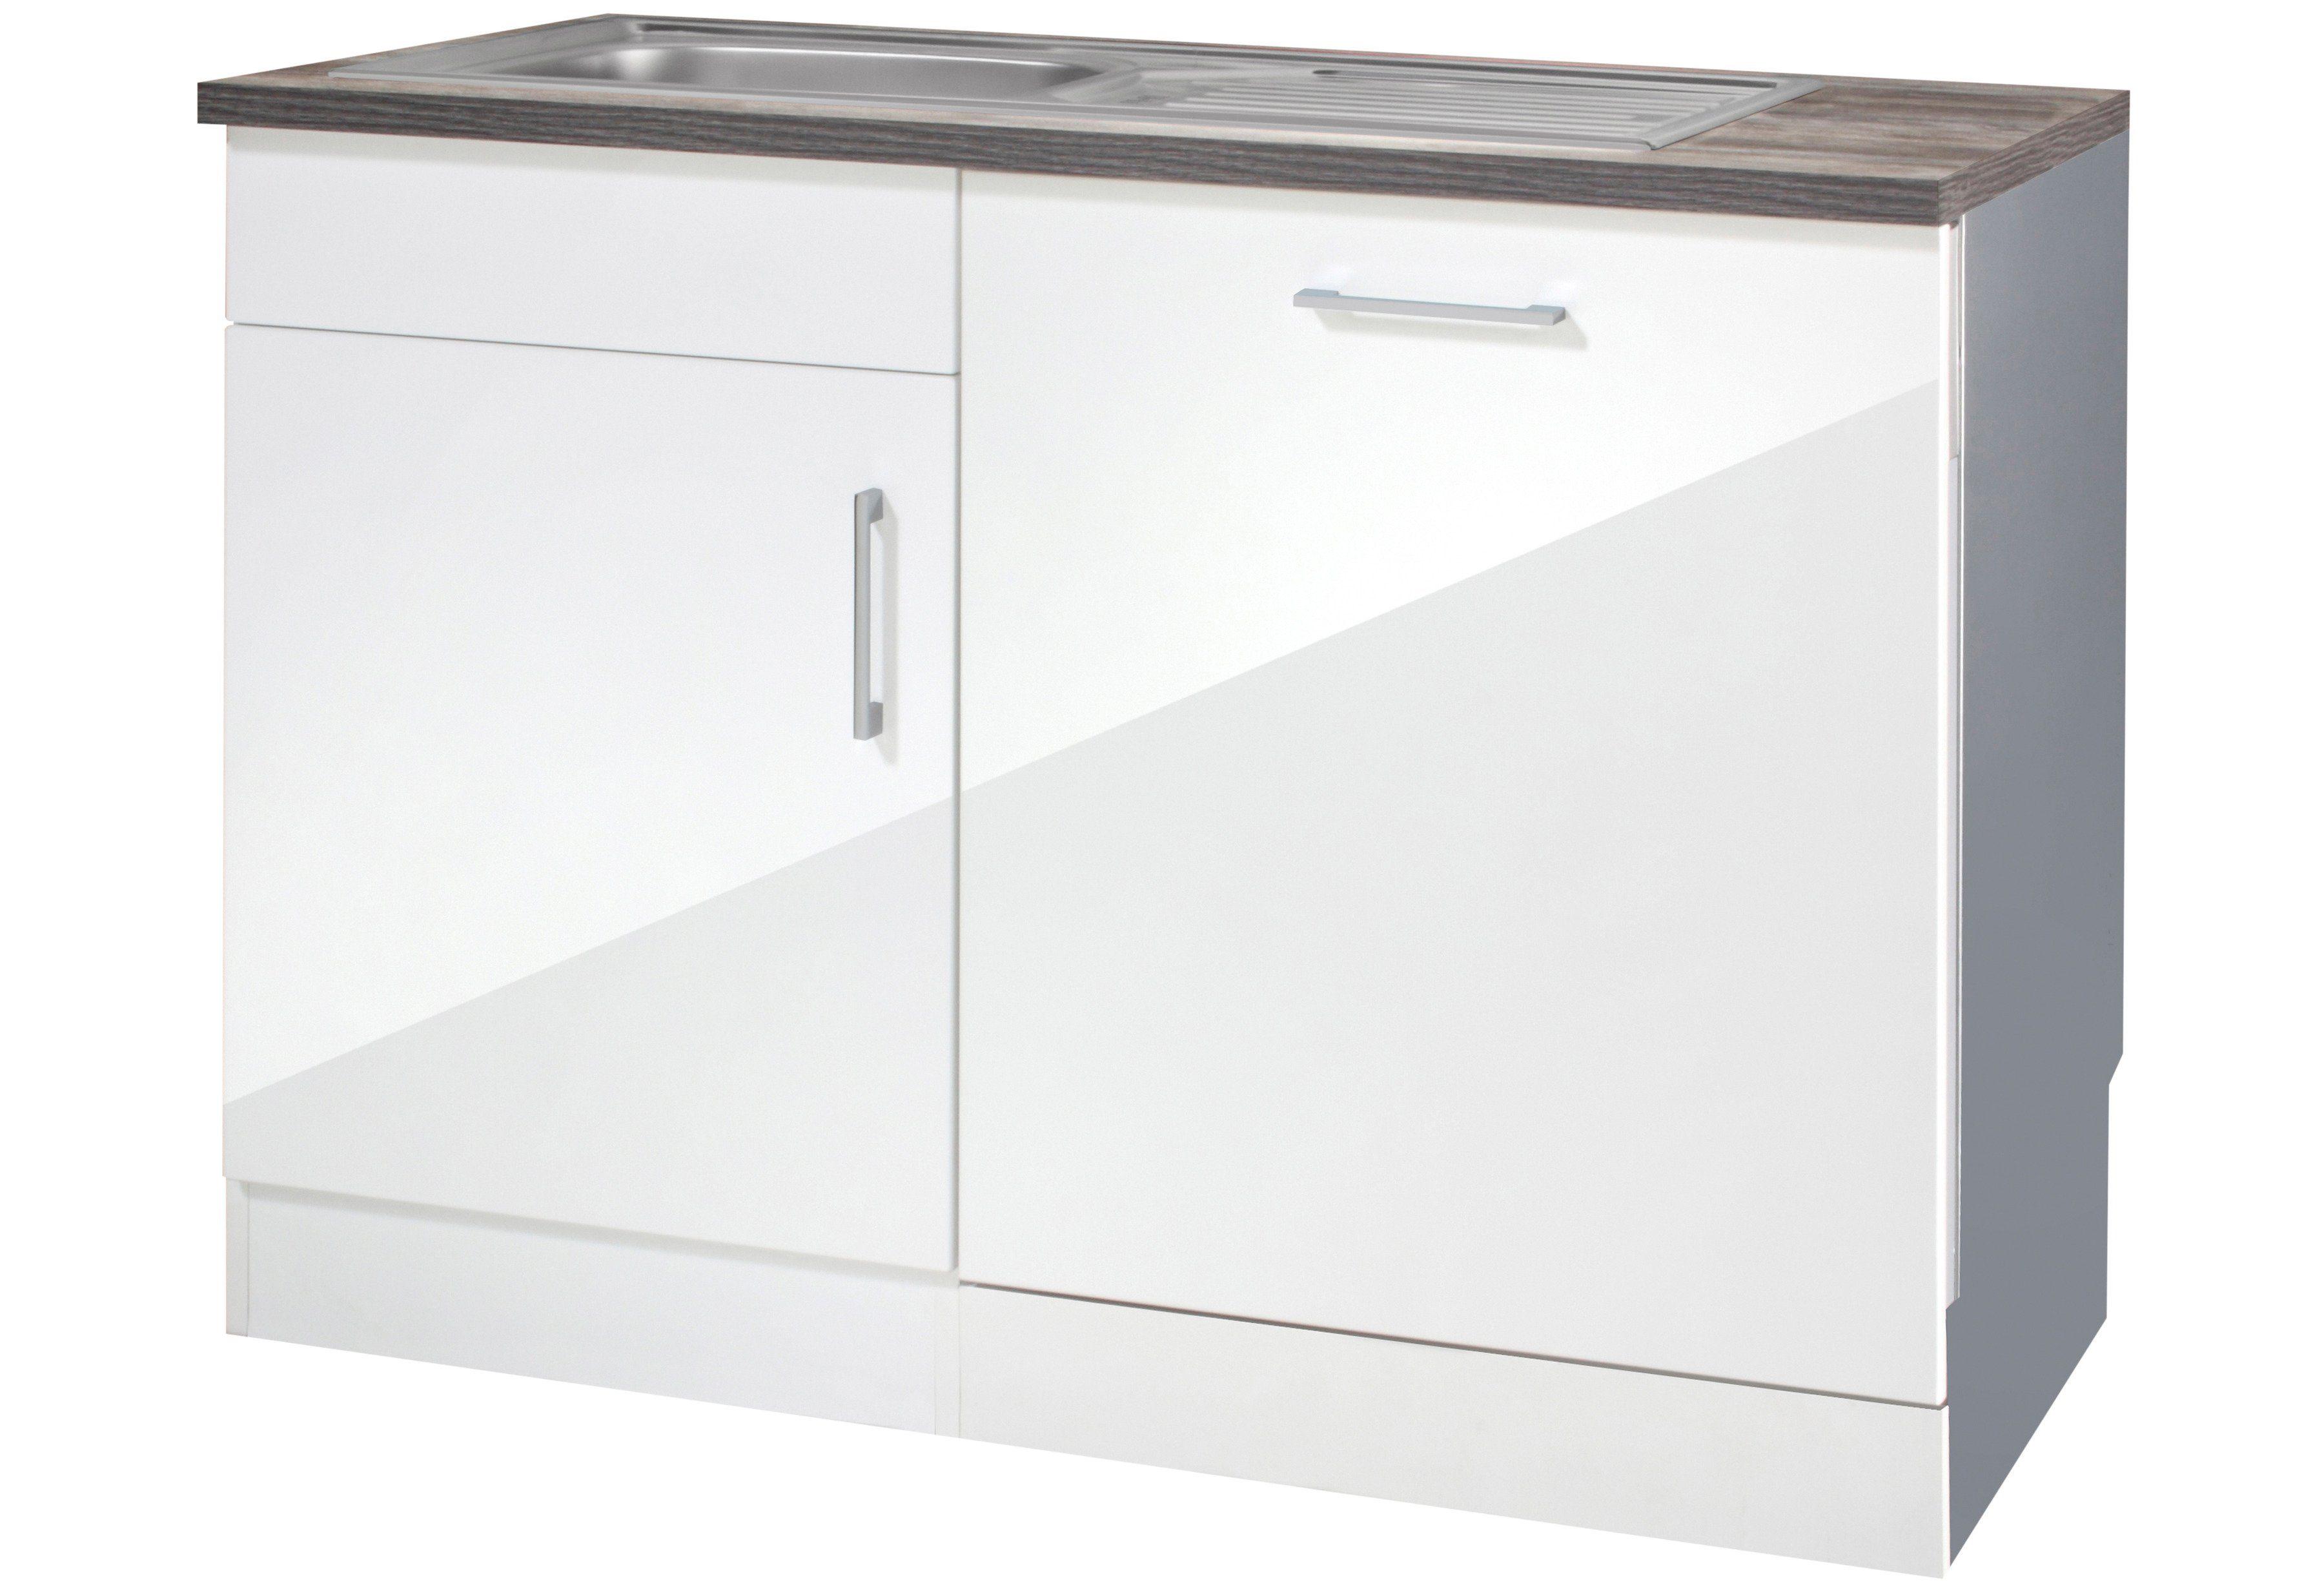 Held Möbel Spülenschrank »Philadelphia«, Breite 110 cm